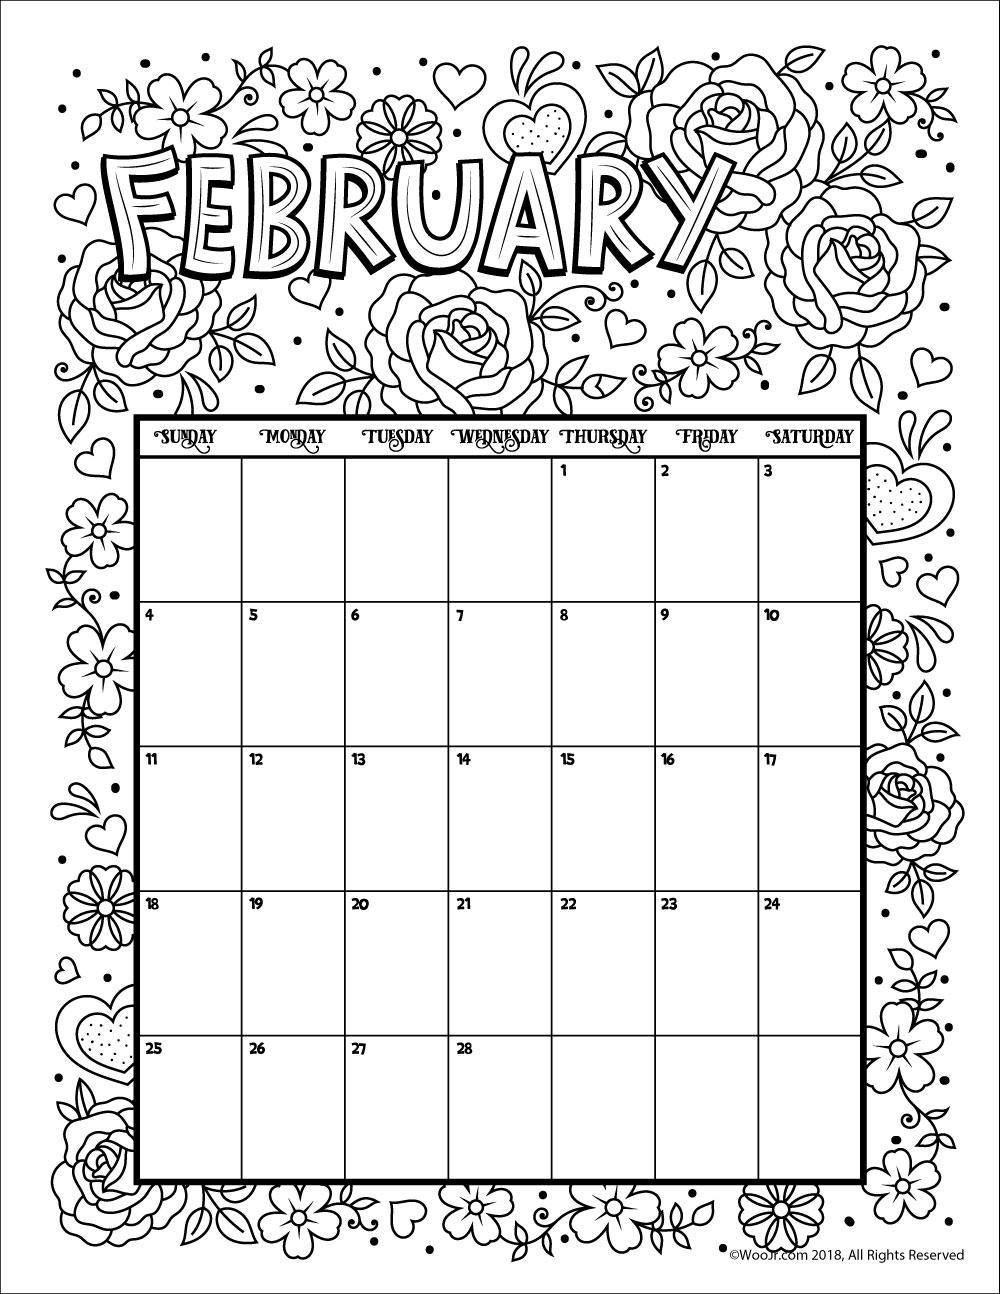 February 2018 Coloring Calendar Page - Woo! Jr. Kids Activities